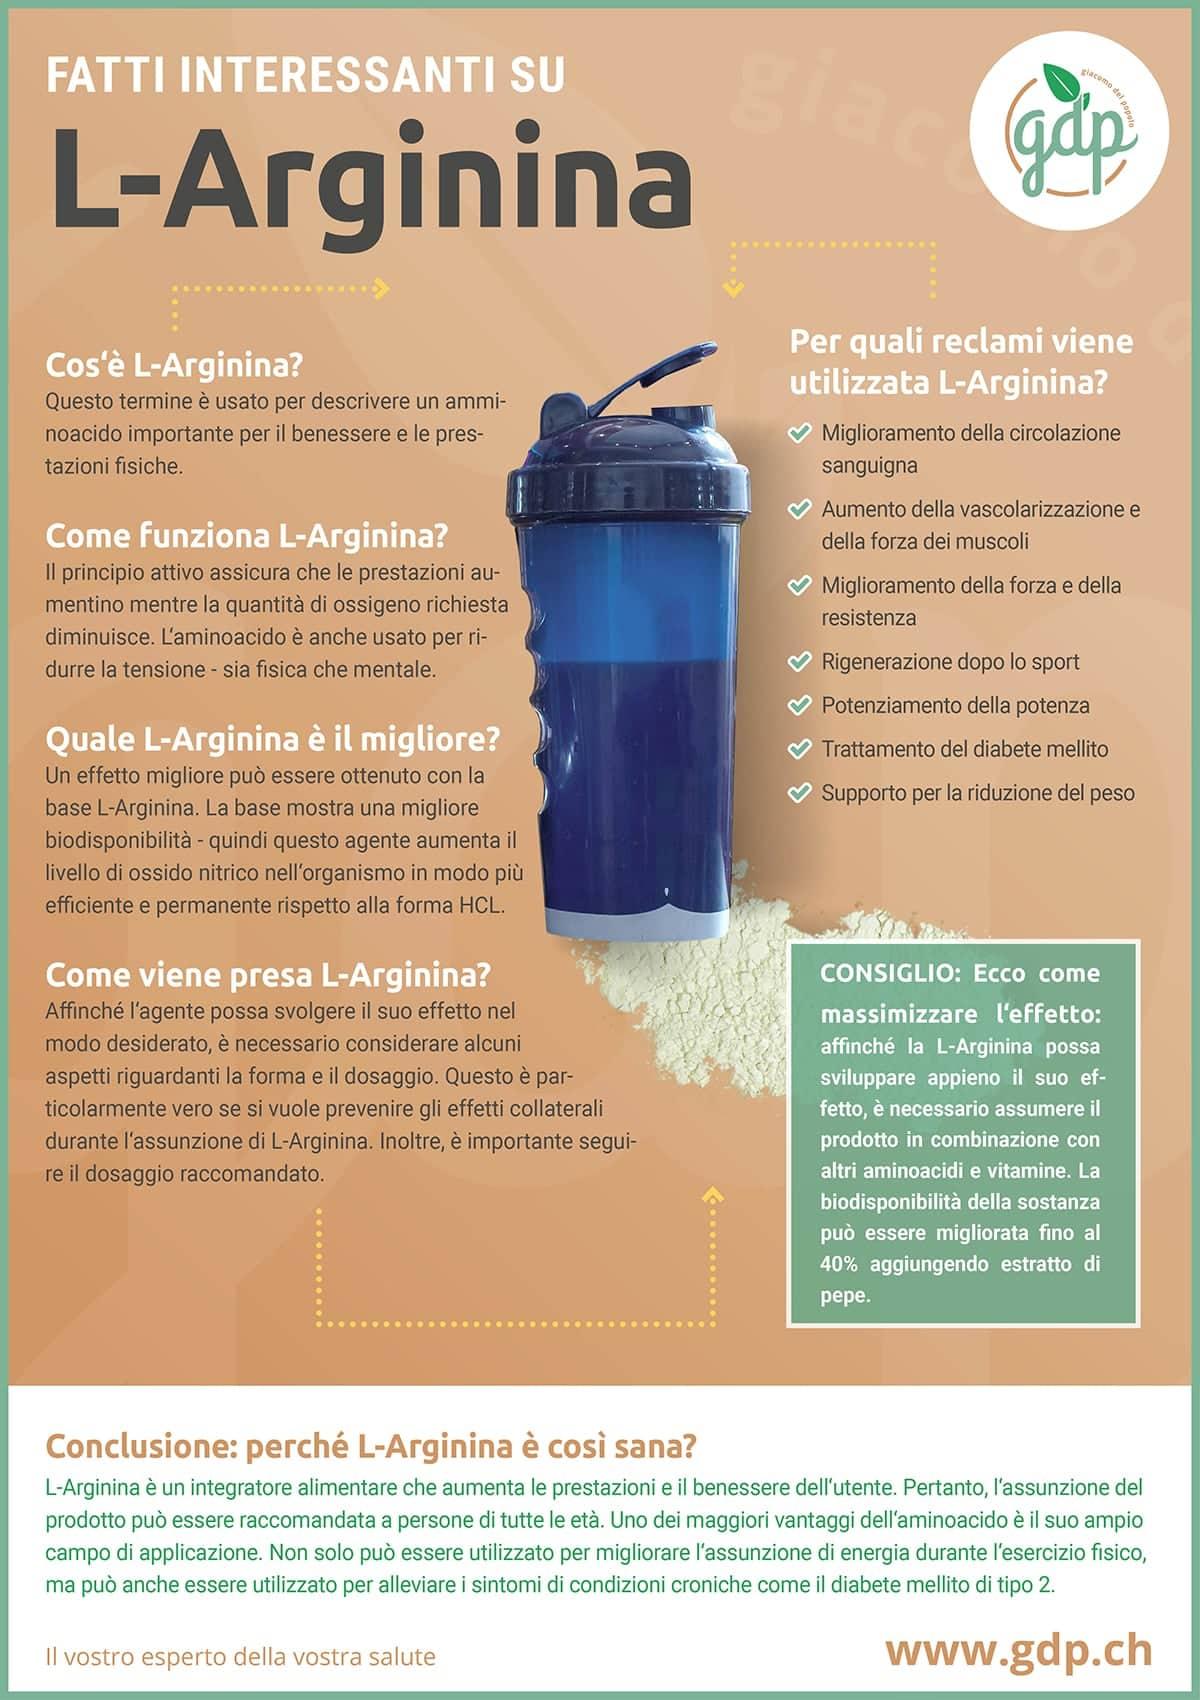 gdp infografica L-Arginin